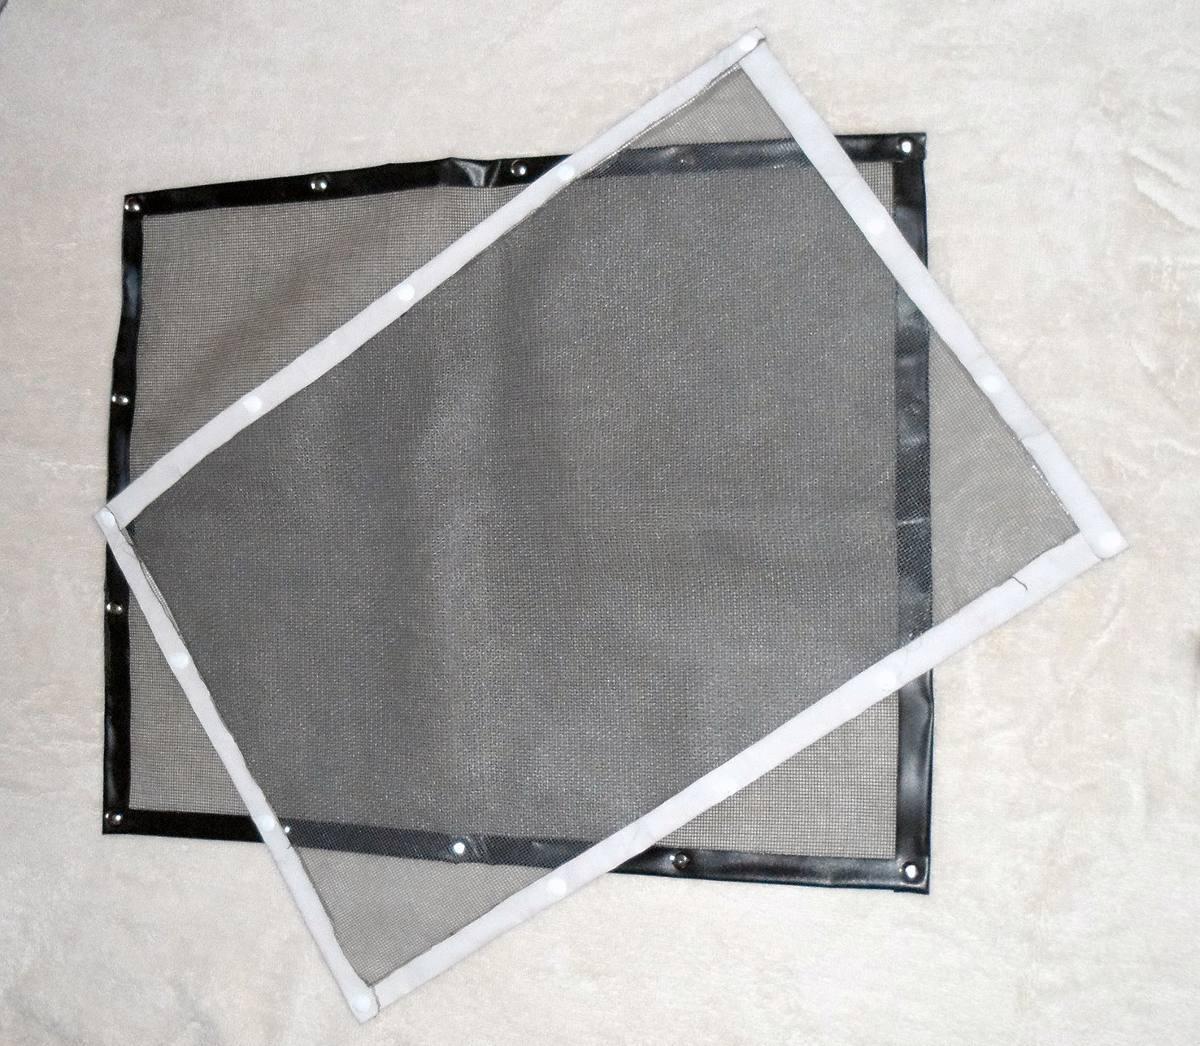 mosquiteros adheribles para ventanas o puertas